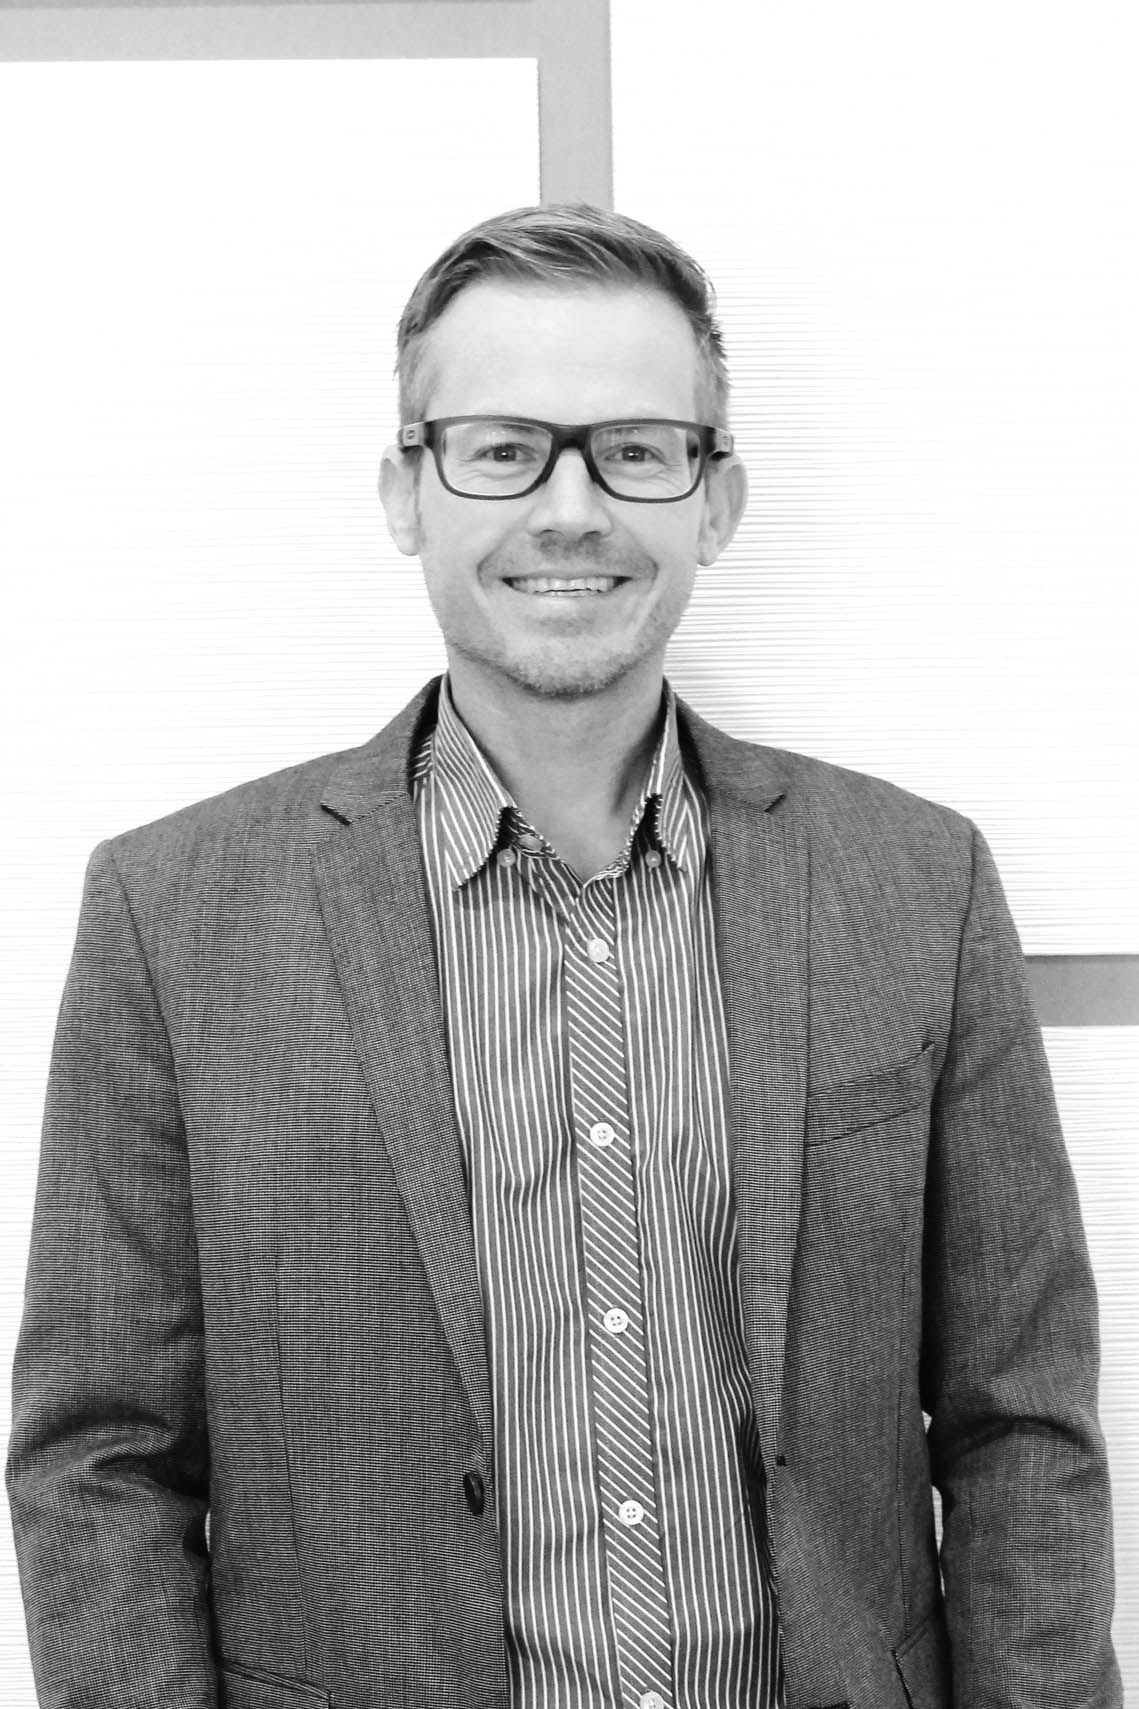 Sean Friedrich